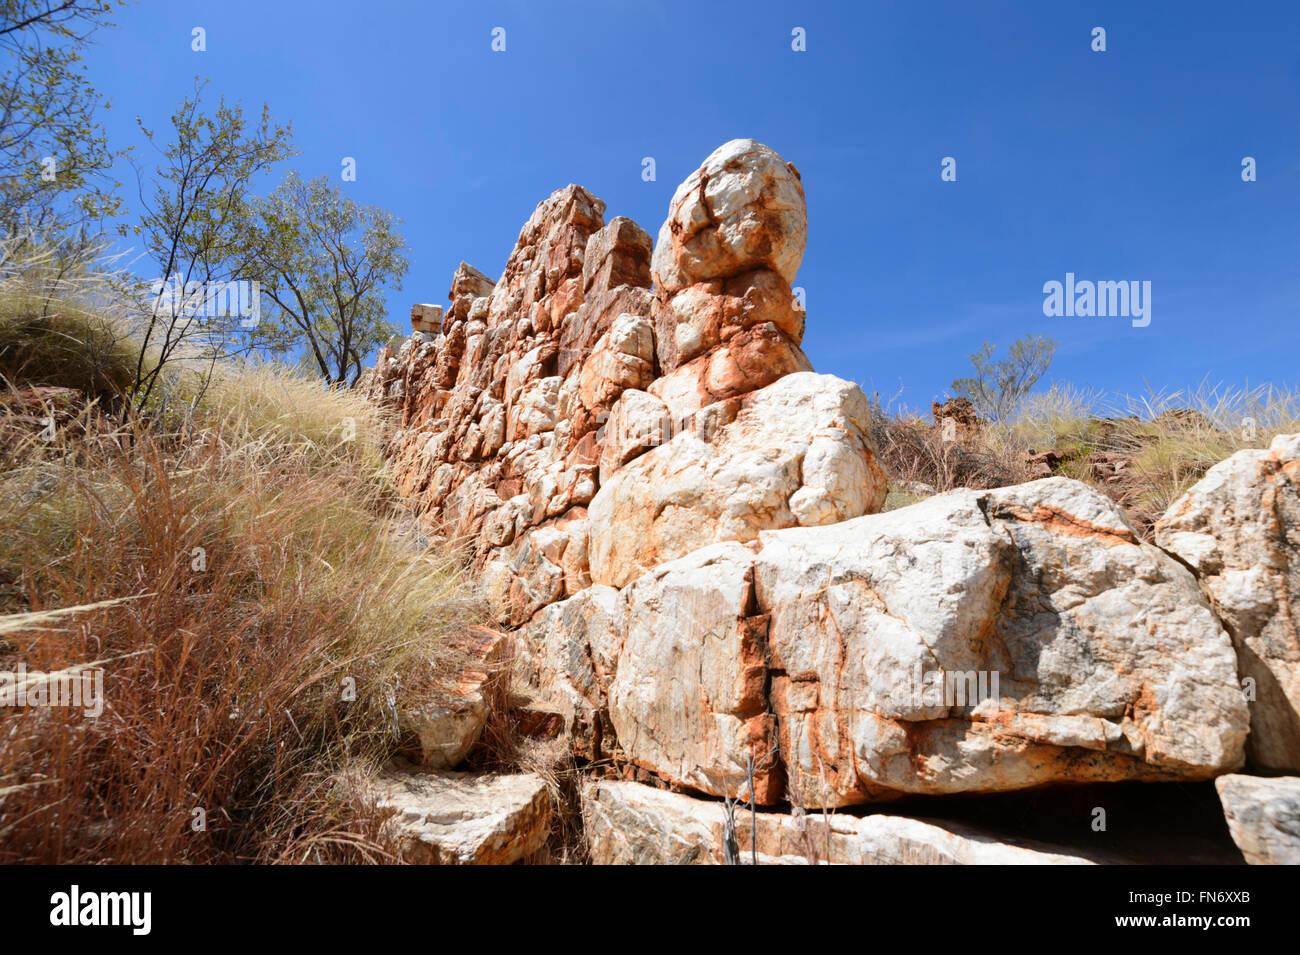 Chine Mur, Halls Creek, région de Kimberley, Western Australia, Australia Photo Stock